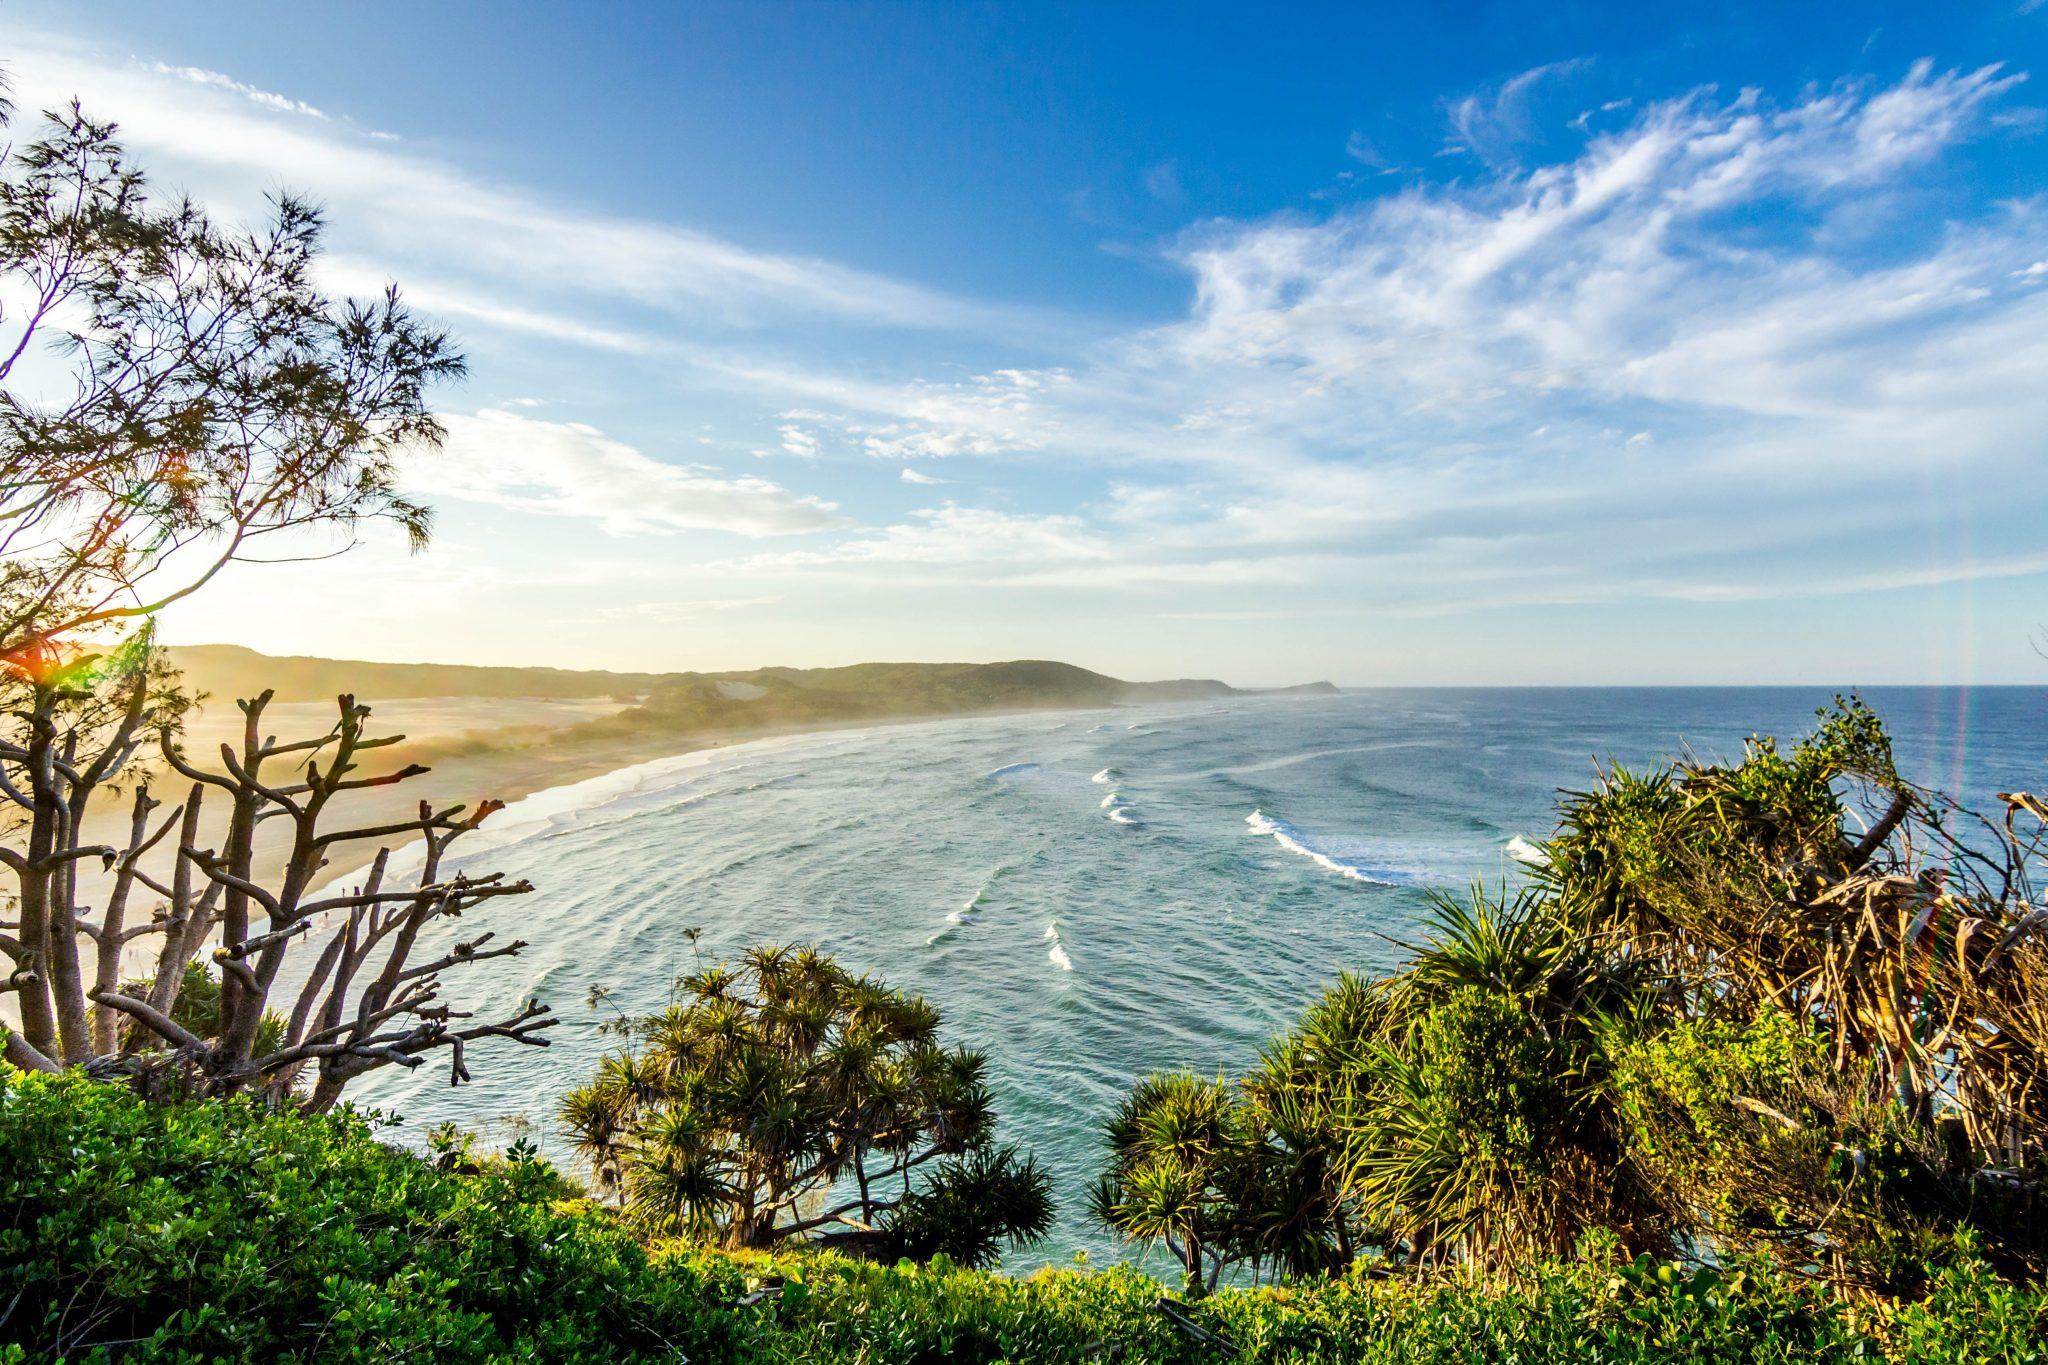 Australian Outback Ocean beach trees